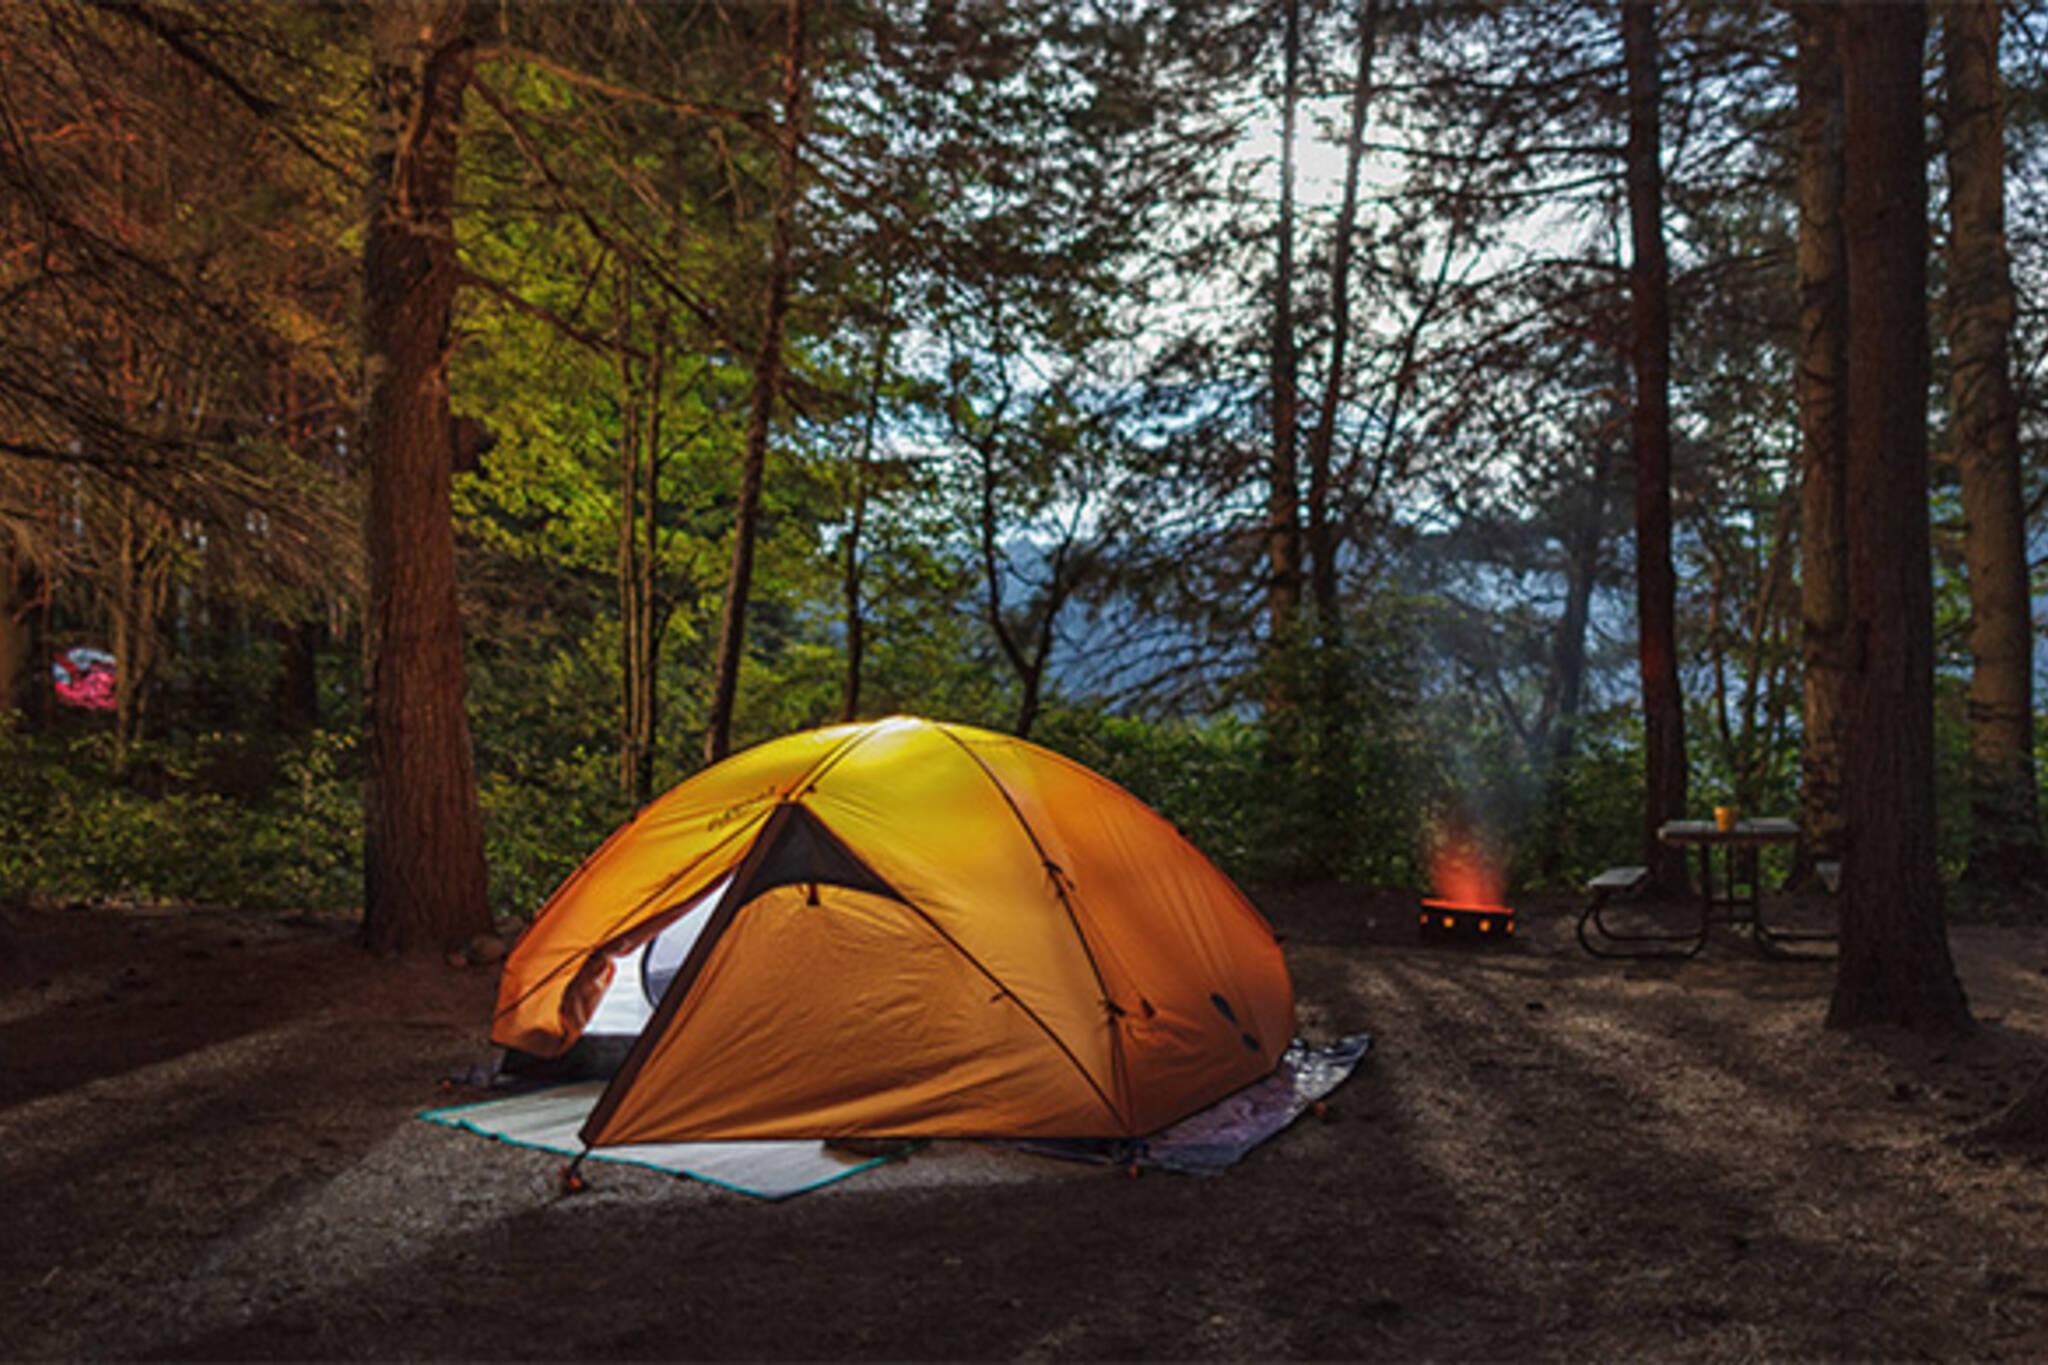 campsites near toronto